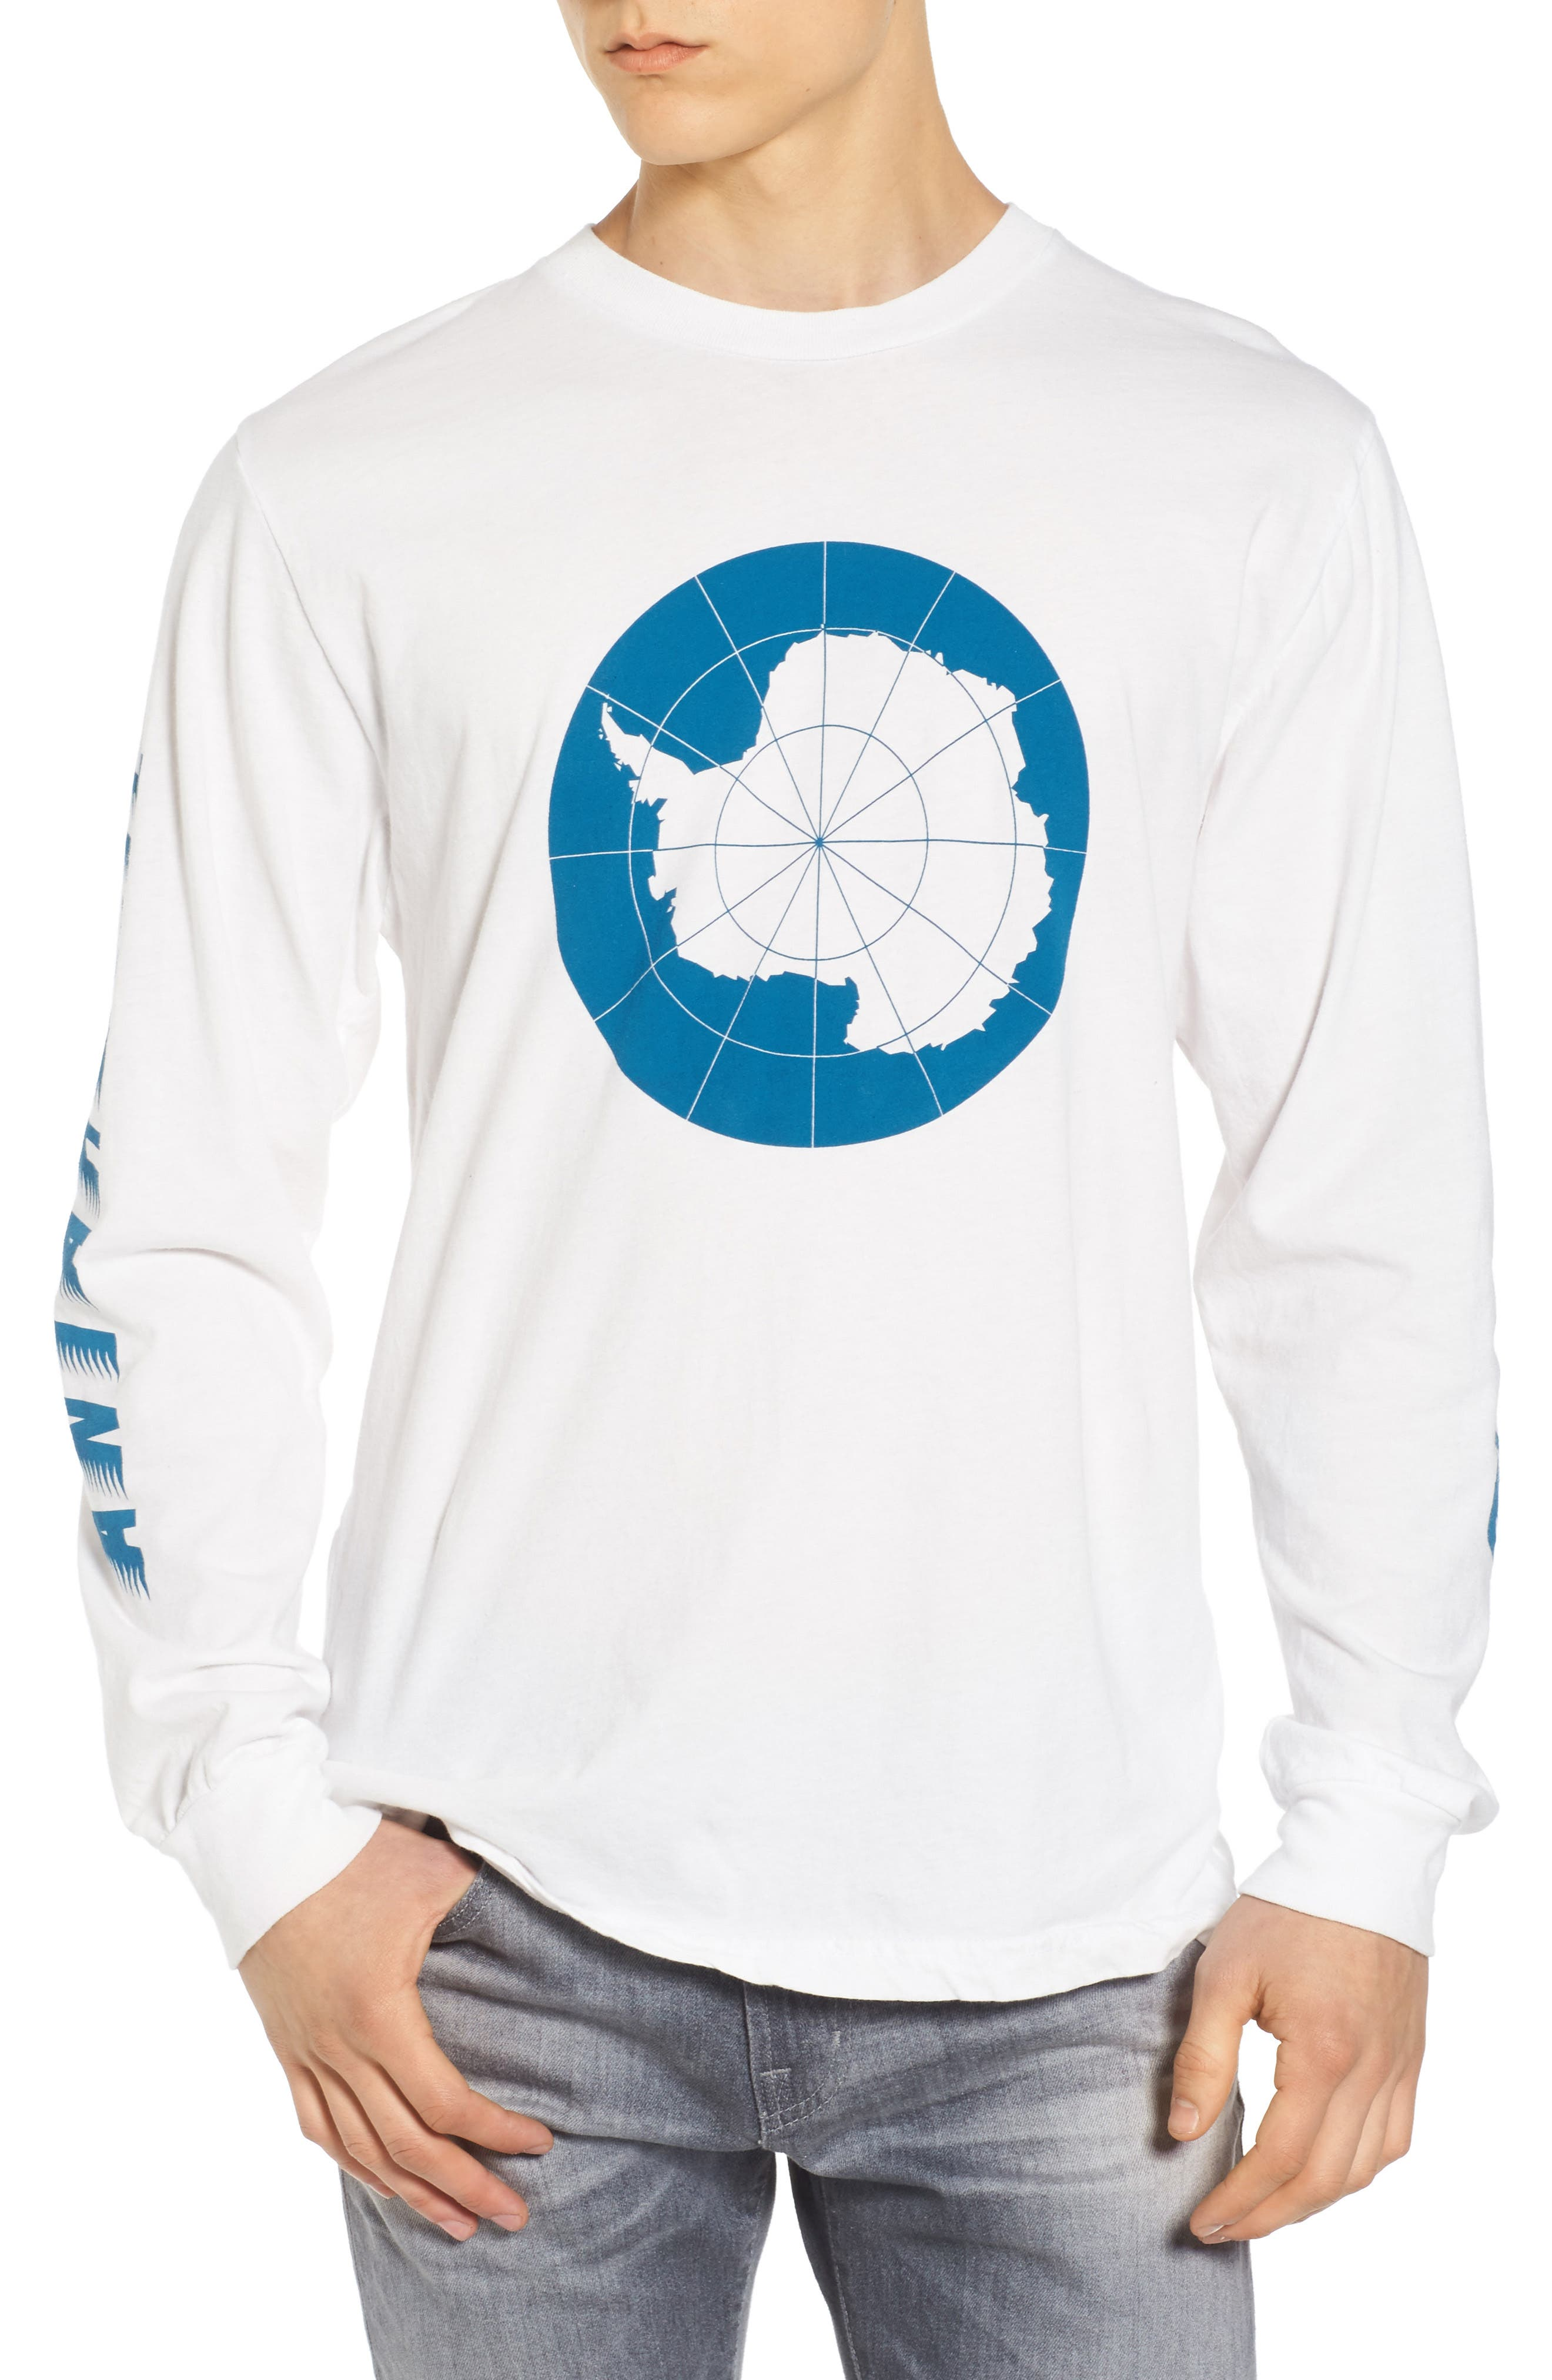 Arctic Ski Club T-Shirt,                         Main,                         color, White